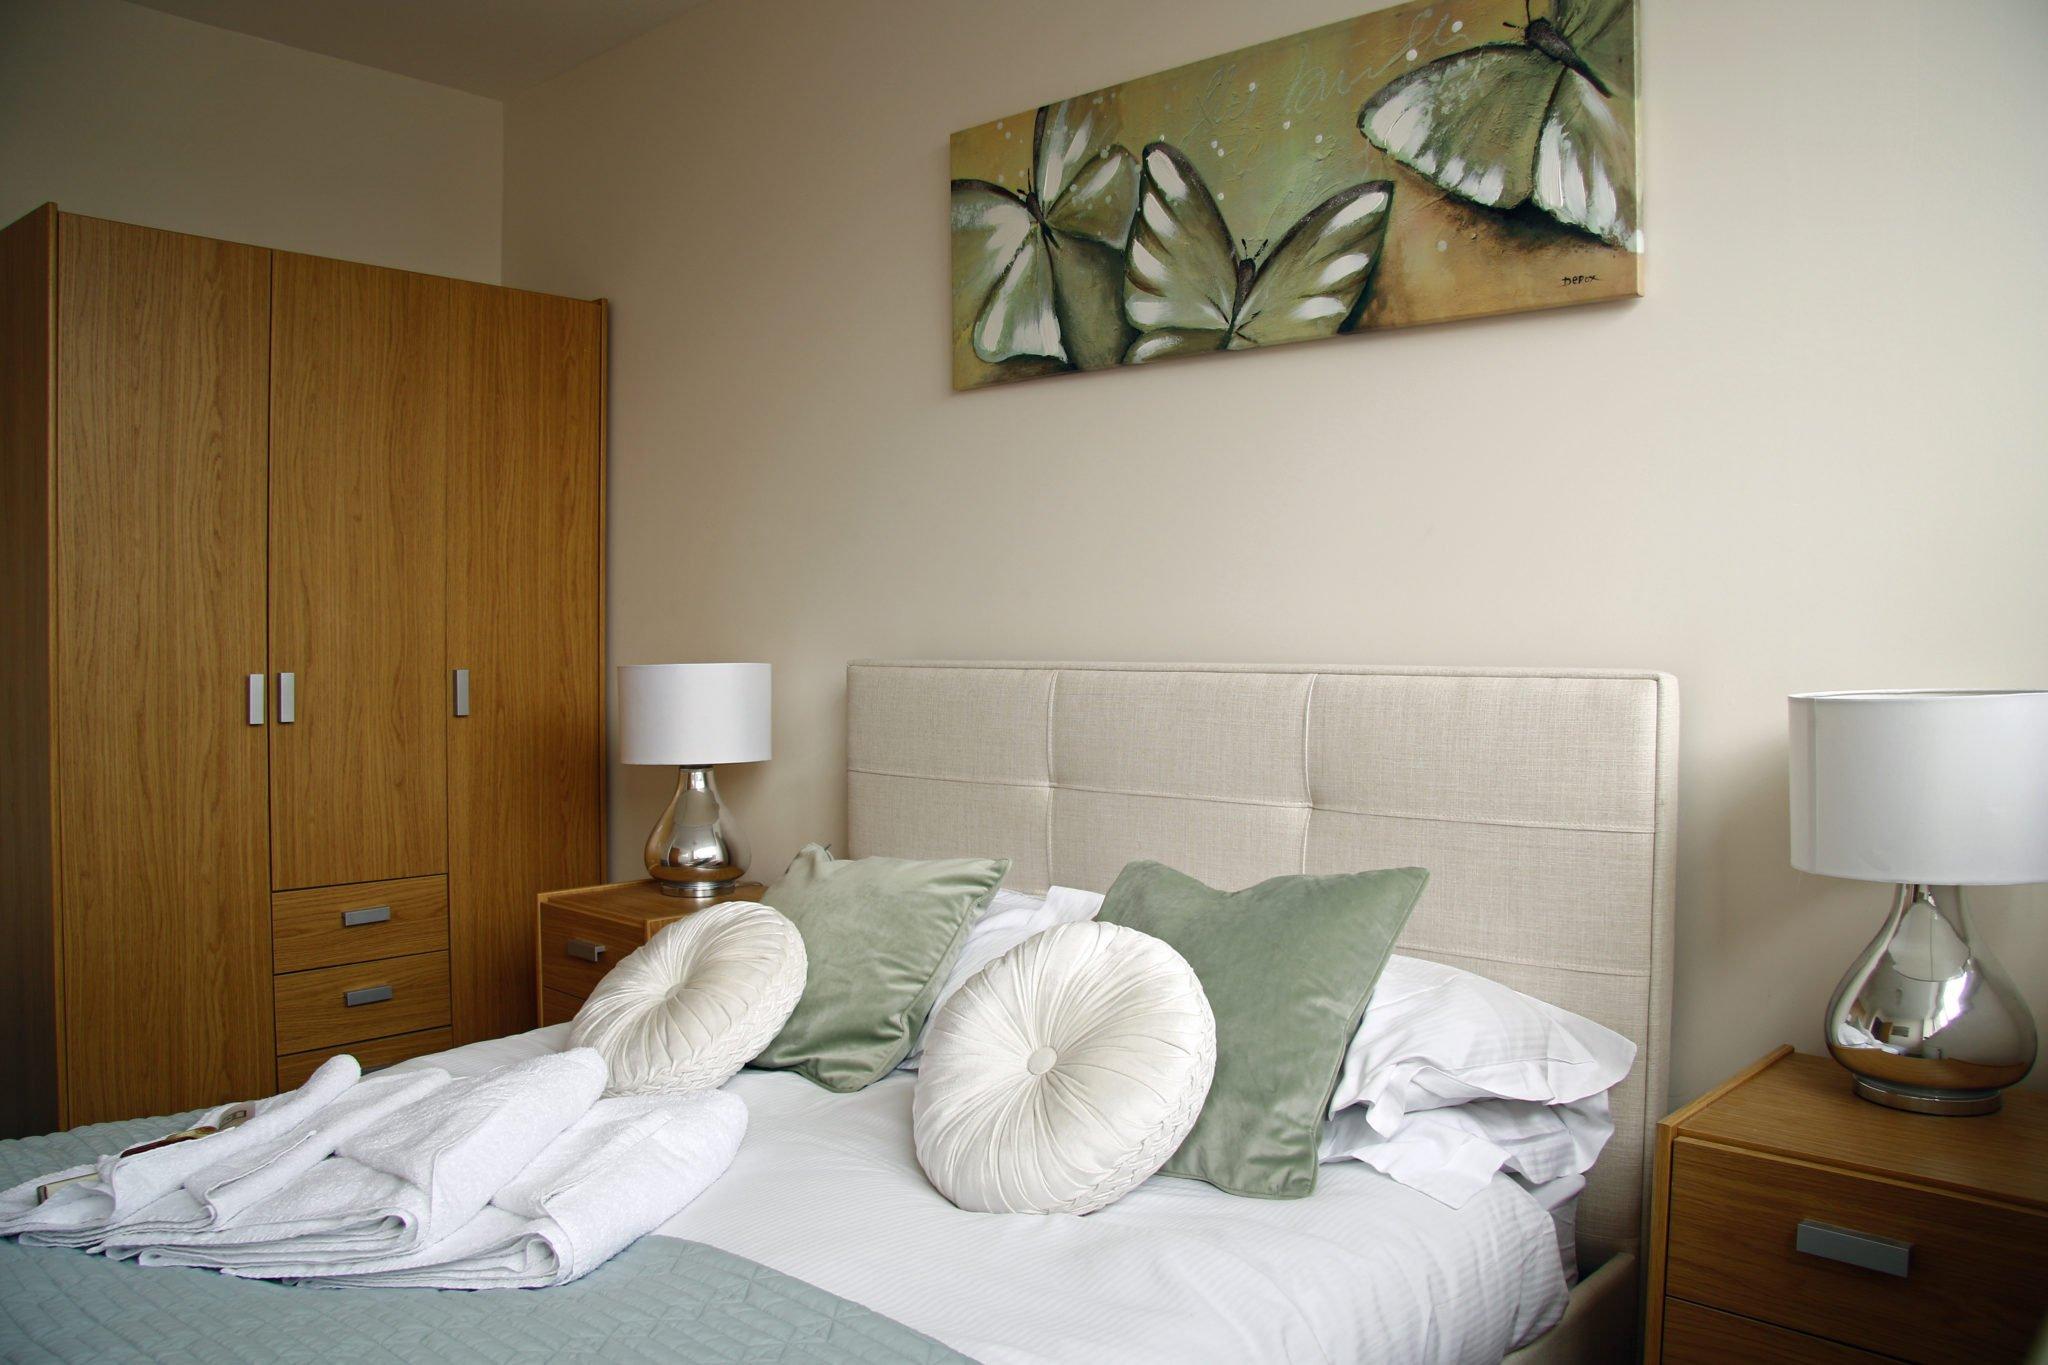 Short-Let-Accommodation-Stevenage---Skyline-House-Serviced-Apartments-Hertfordshire---Self-Catering-Accommodation-UK-|-Urban-Stay